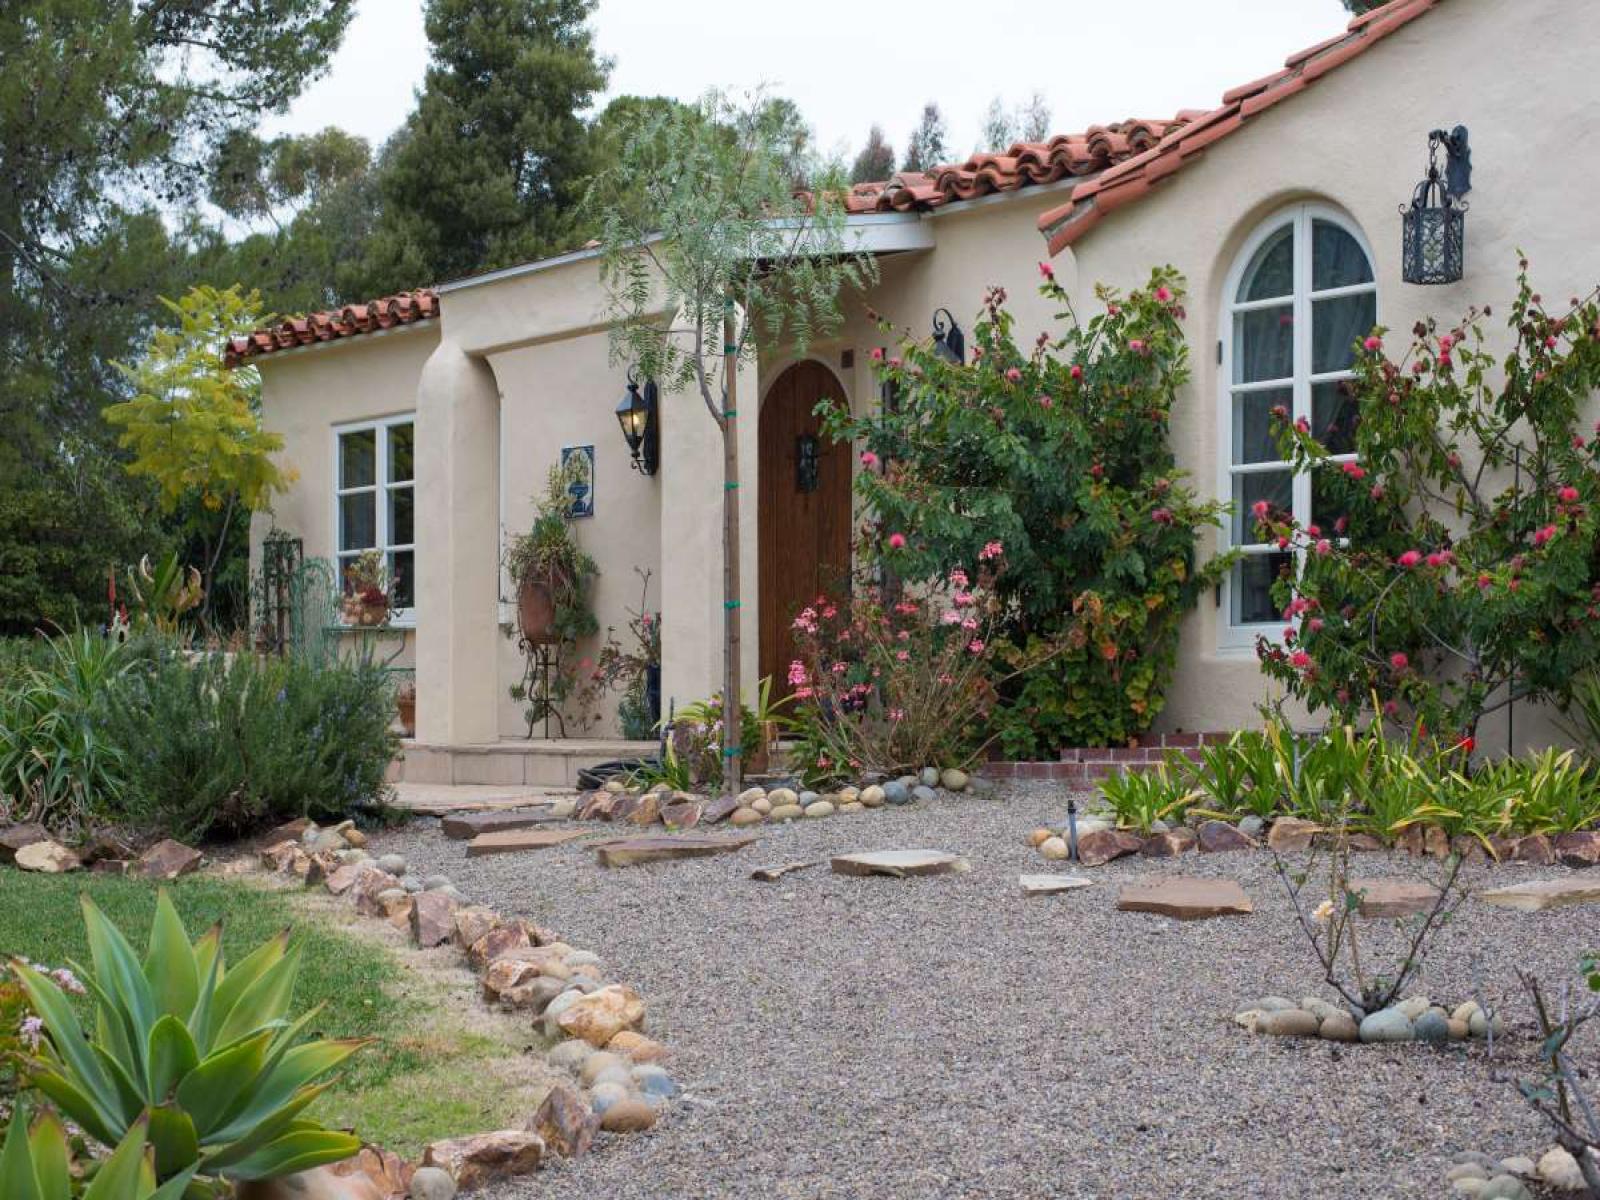 16811 Via De Santa Fe,Rancho Santa Fe,California 92067,House,Via De Santa Fe,1006